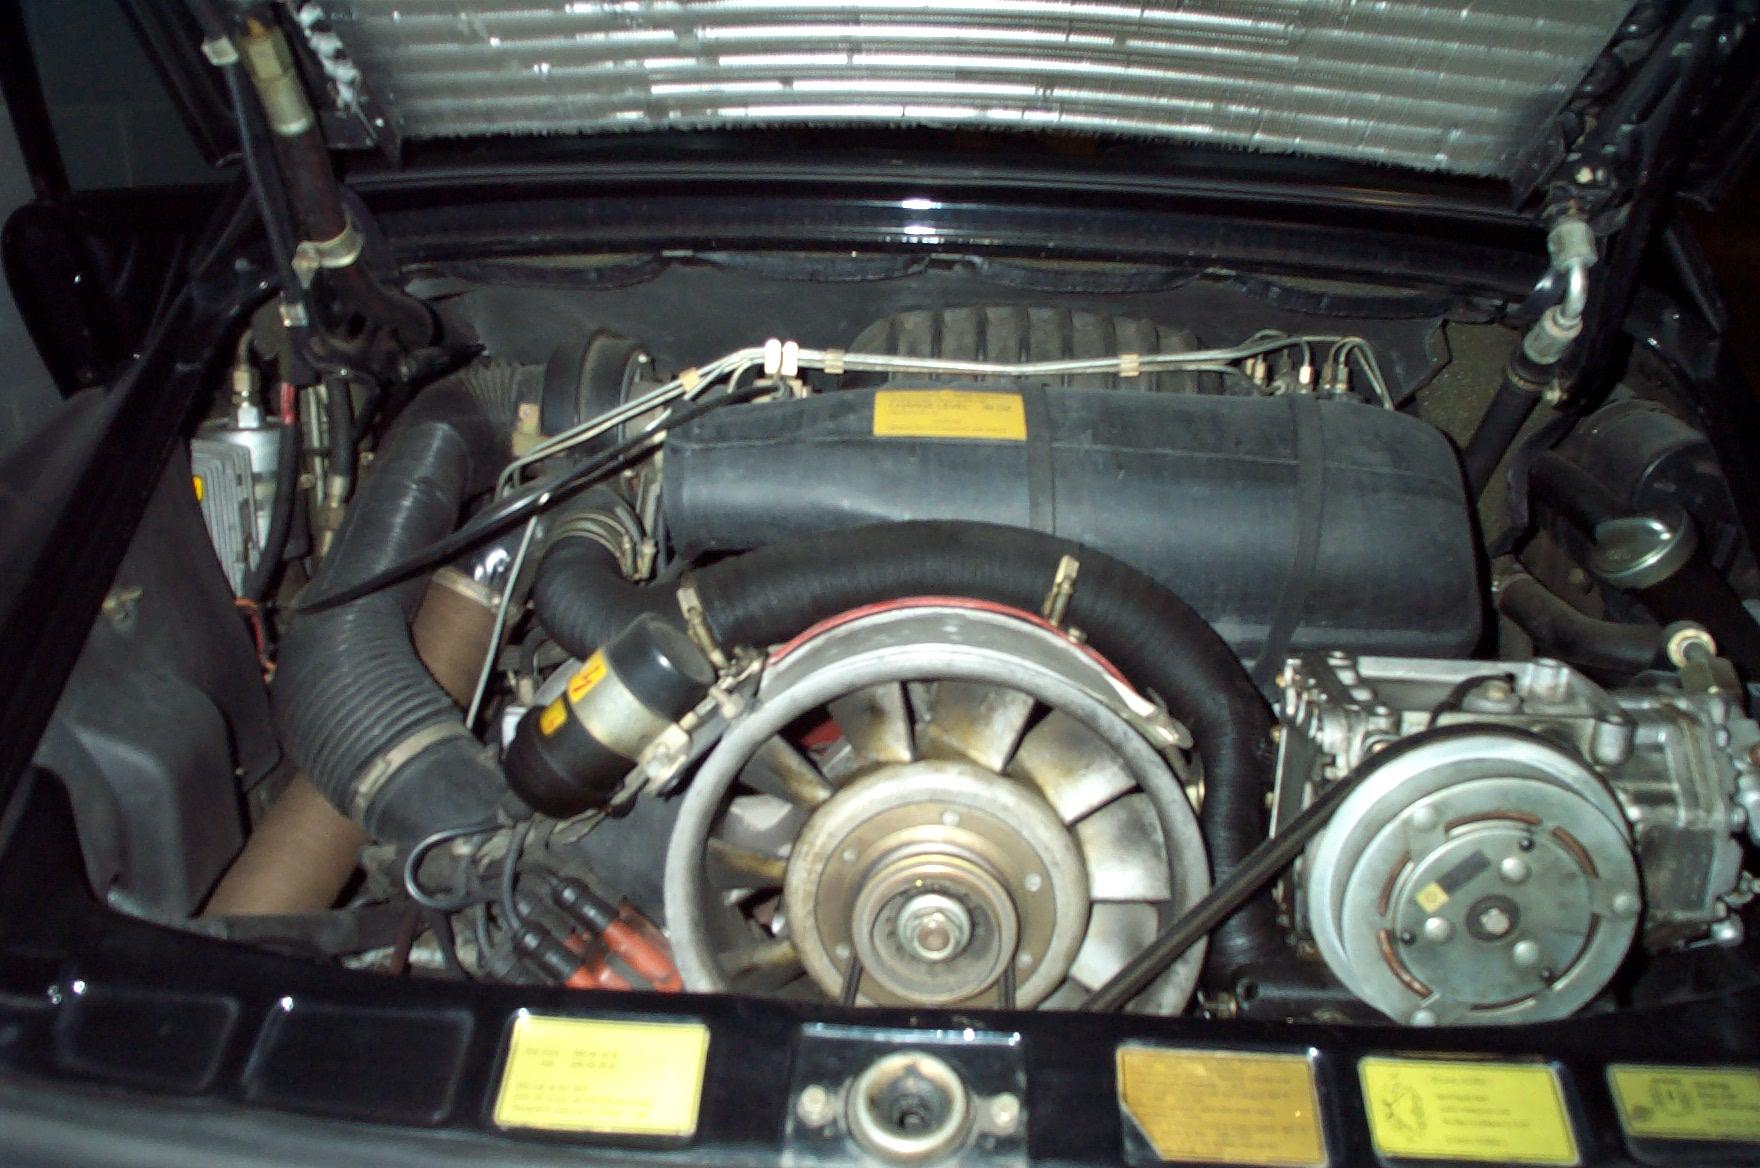 1983 911sc Smog Removal 911 912 Series Renntech Org